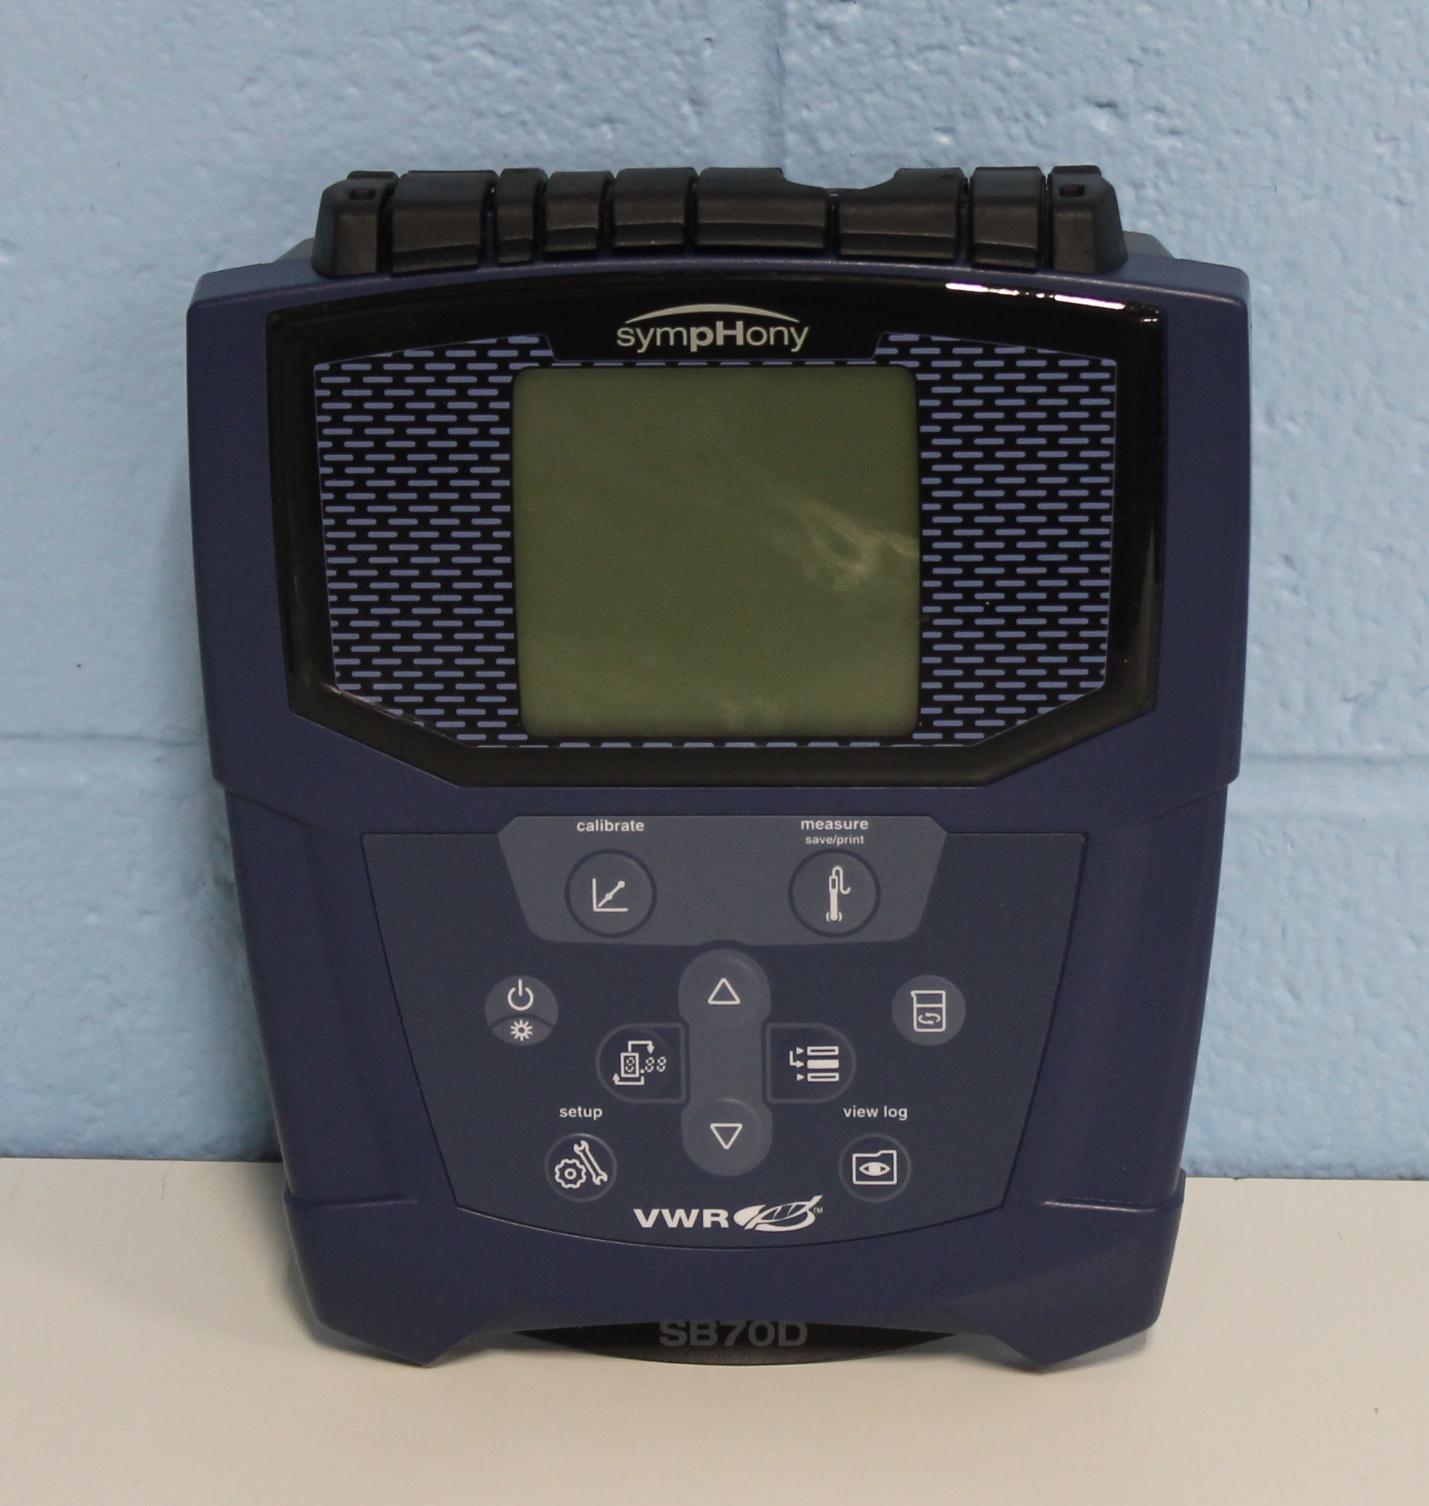 VWR sympHony SB70D Dissolved Oxygen Meter Image